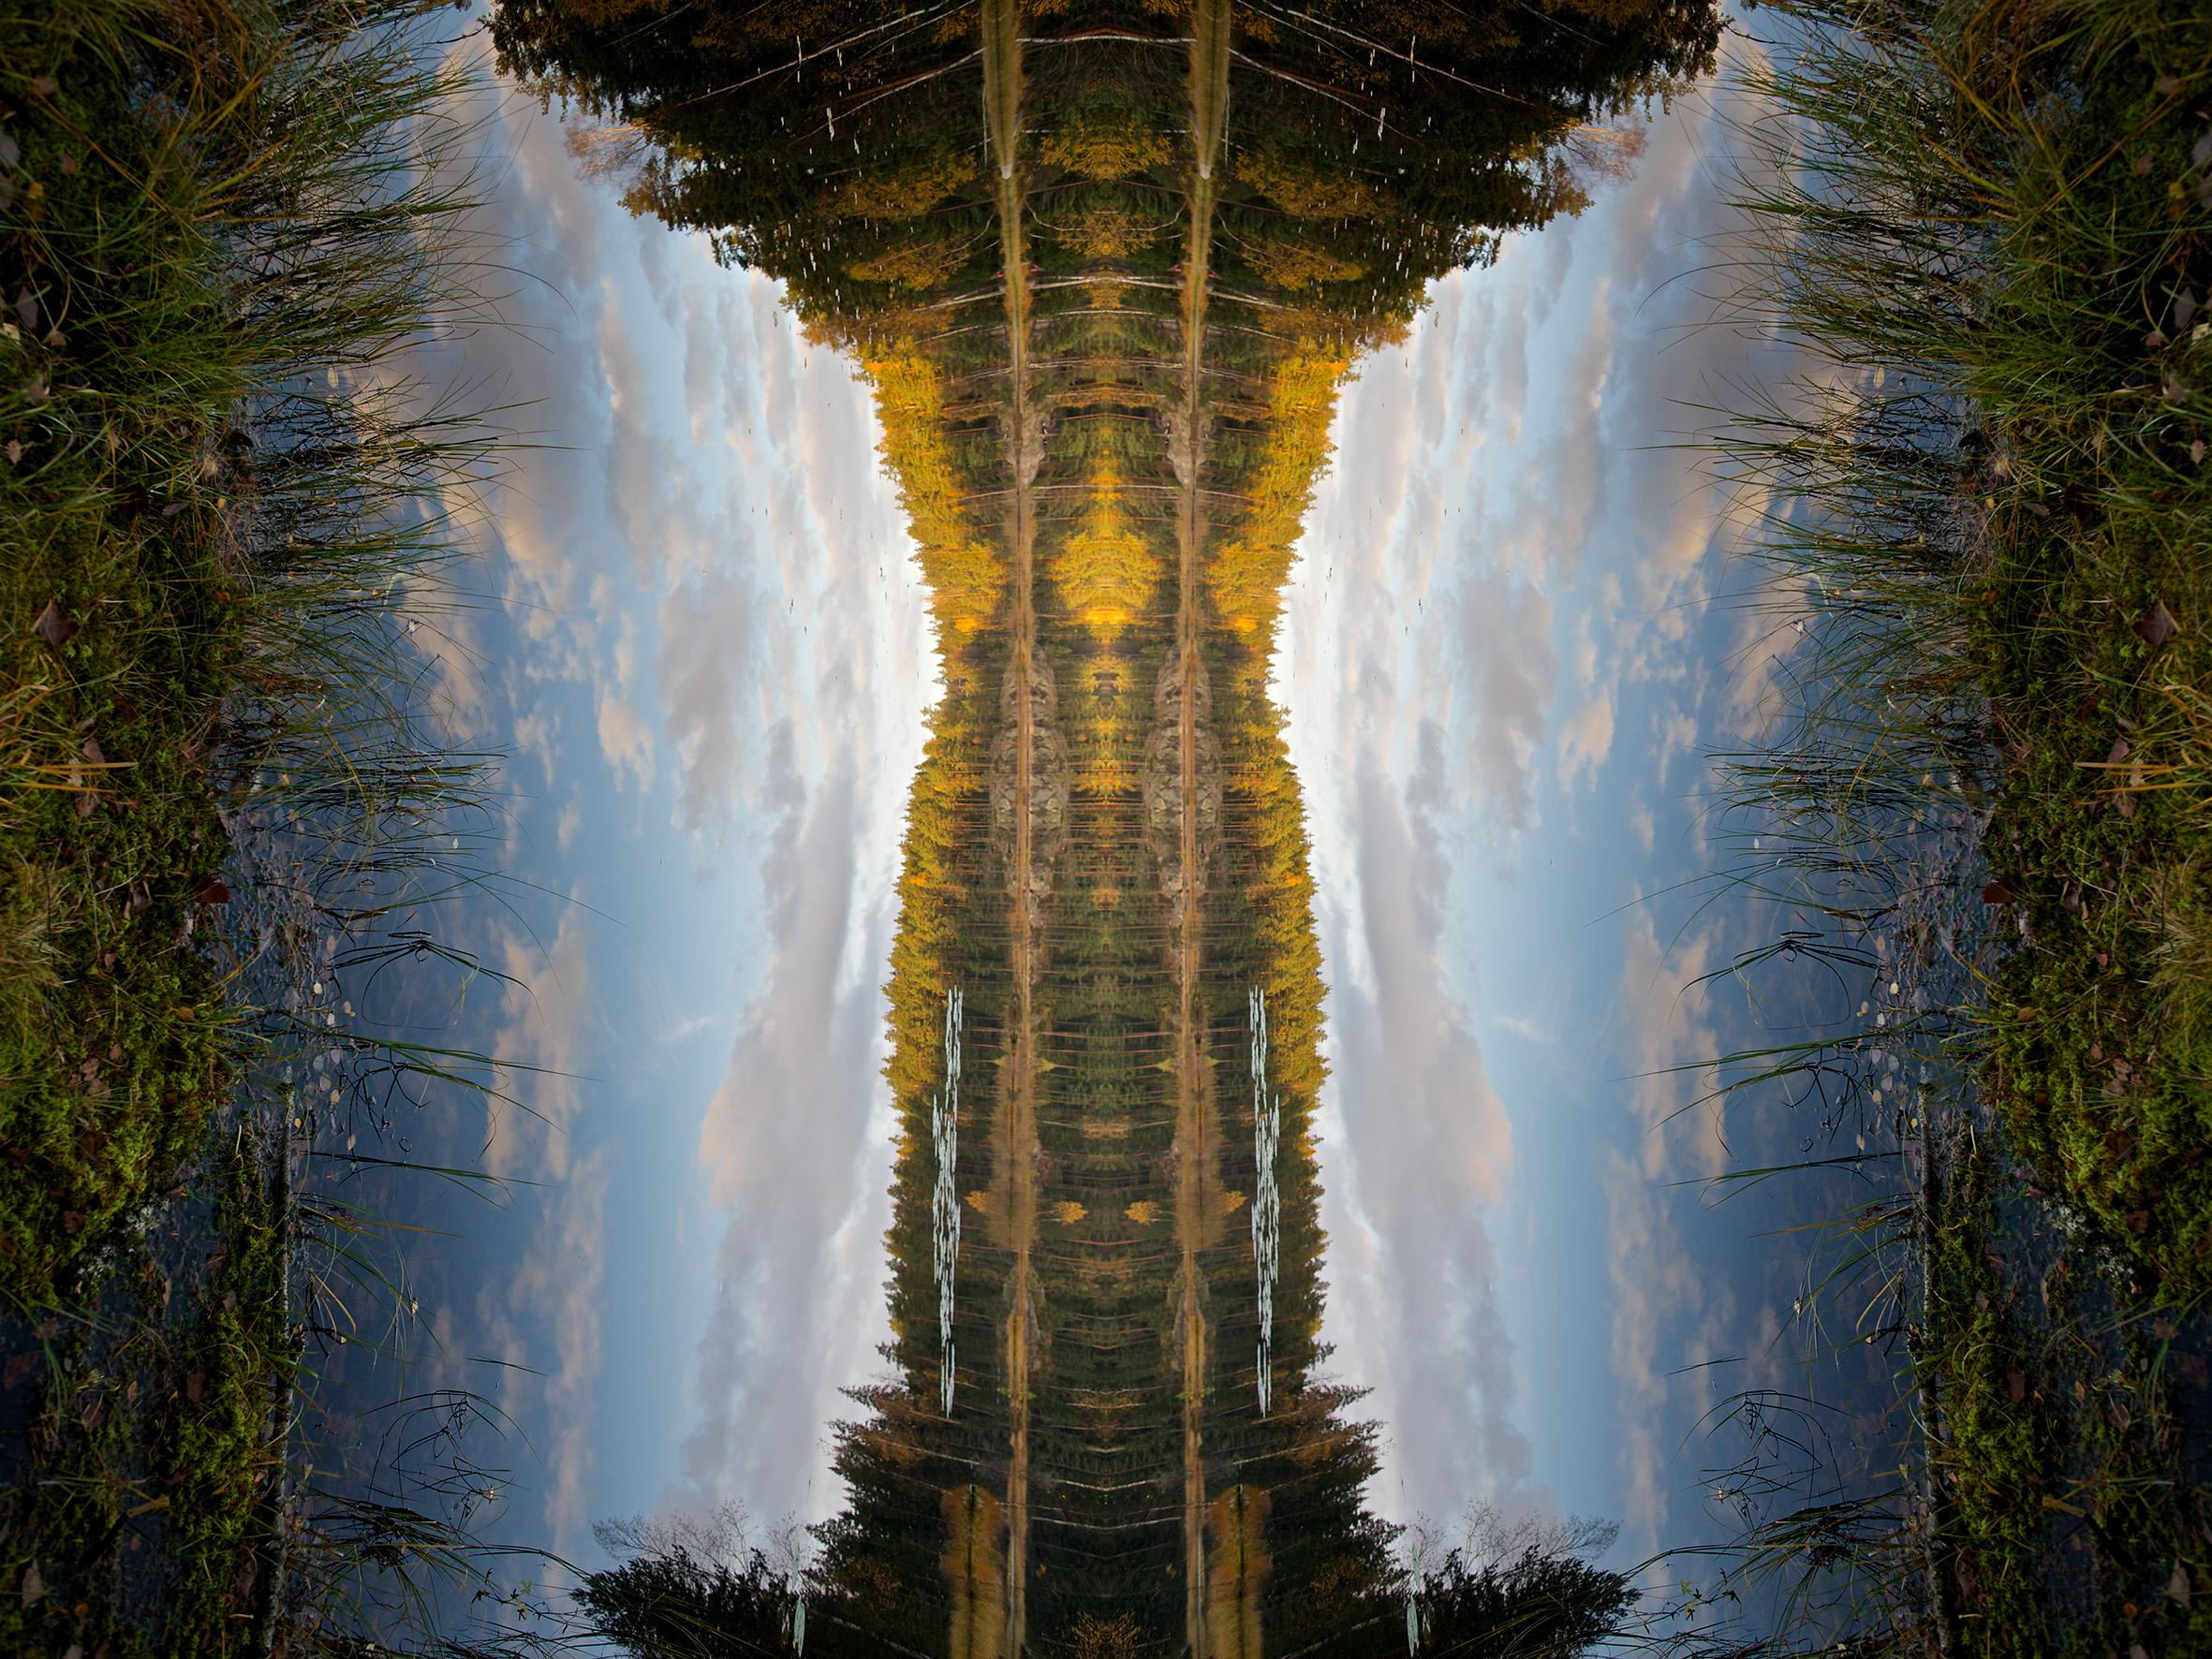 Mirror_Finland_Nuuksio_Peili3X.jpg